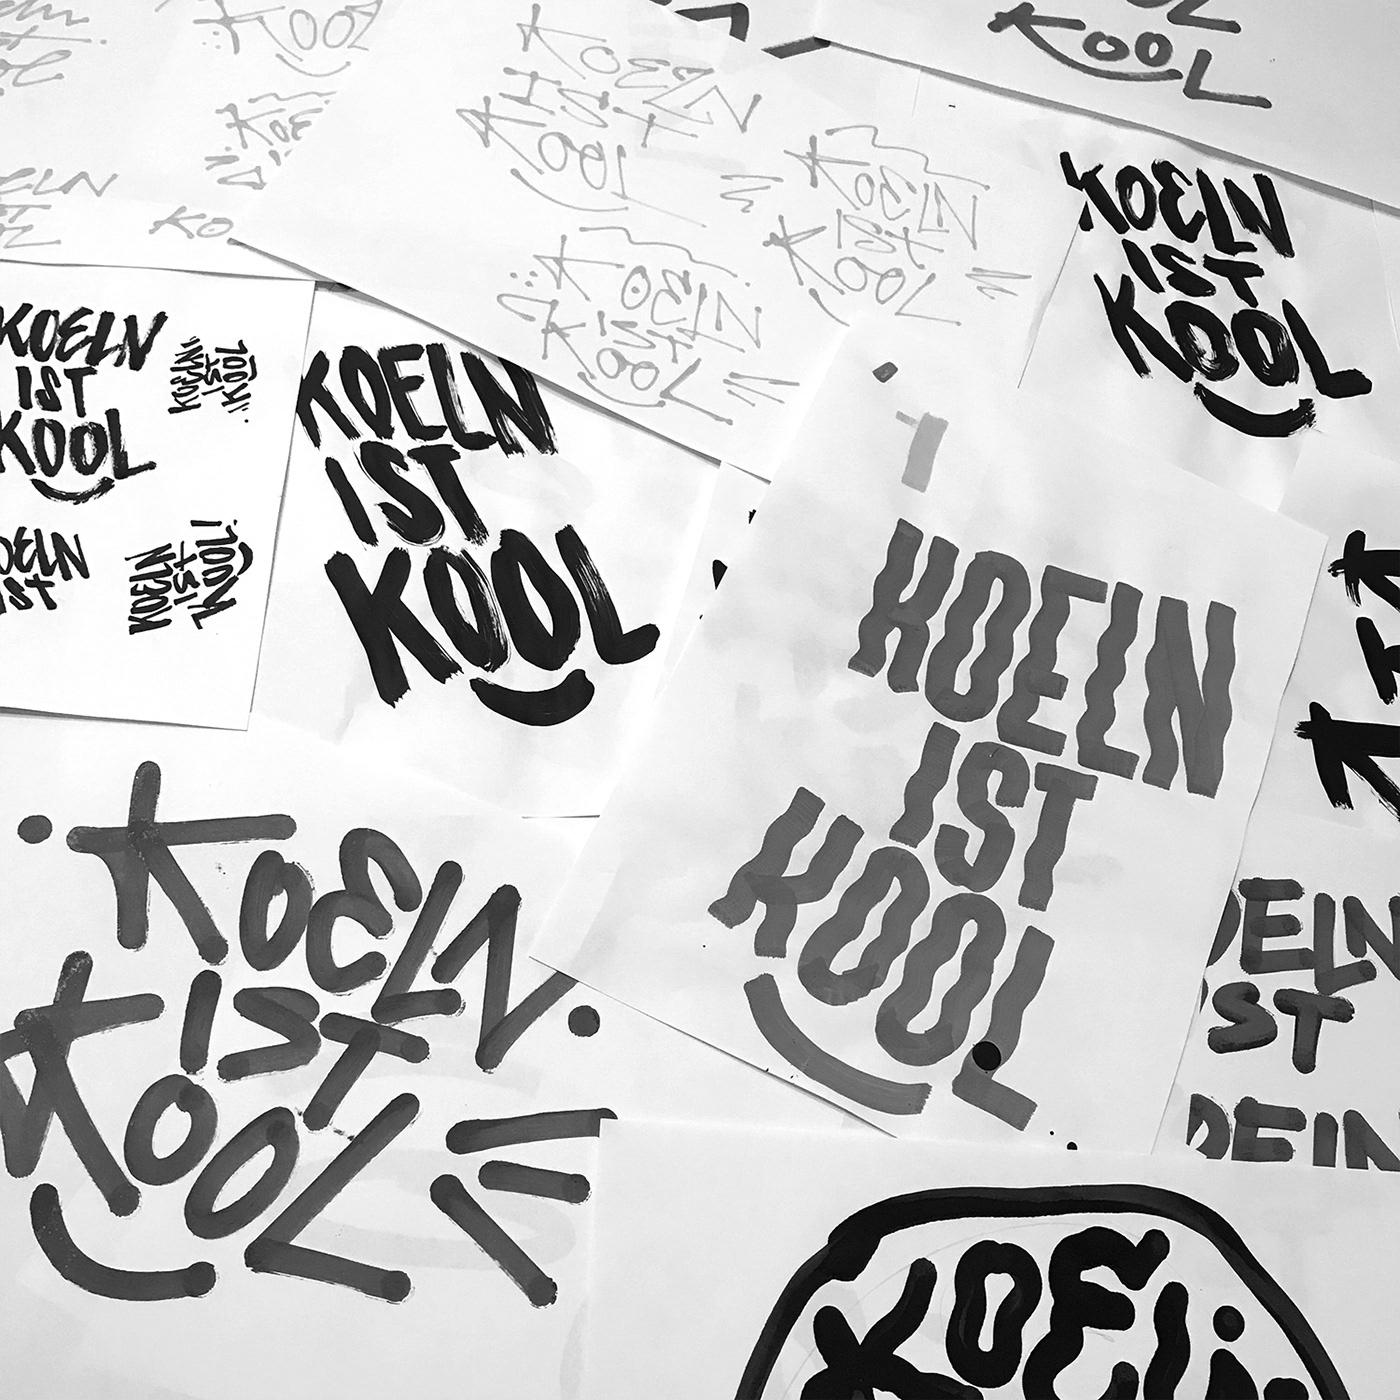 Fashion  Graffiti hoodie merchandise screenprint shirtdesign Street Urban writing  apparel